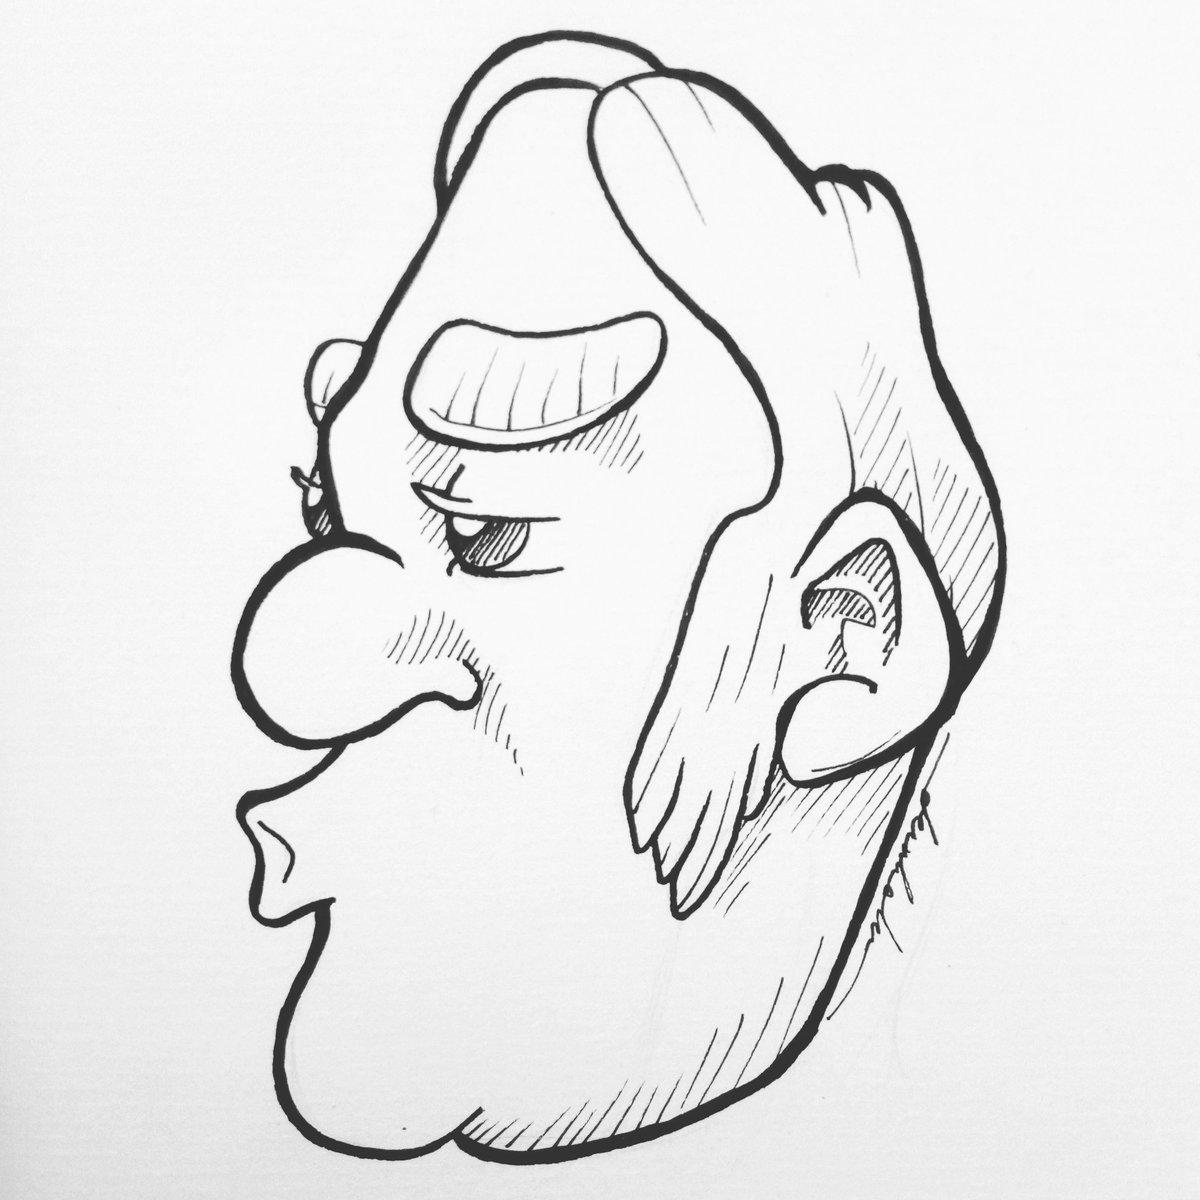 Owwwwww... 😗 #dailyart #dailyillustration #pout #pouting #onestroke #blackandwhitedrawing #face https://t.co/q7AX1jKrGn